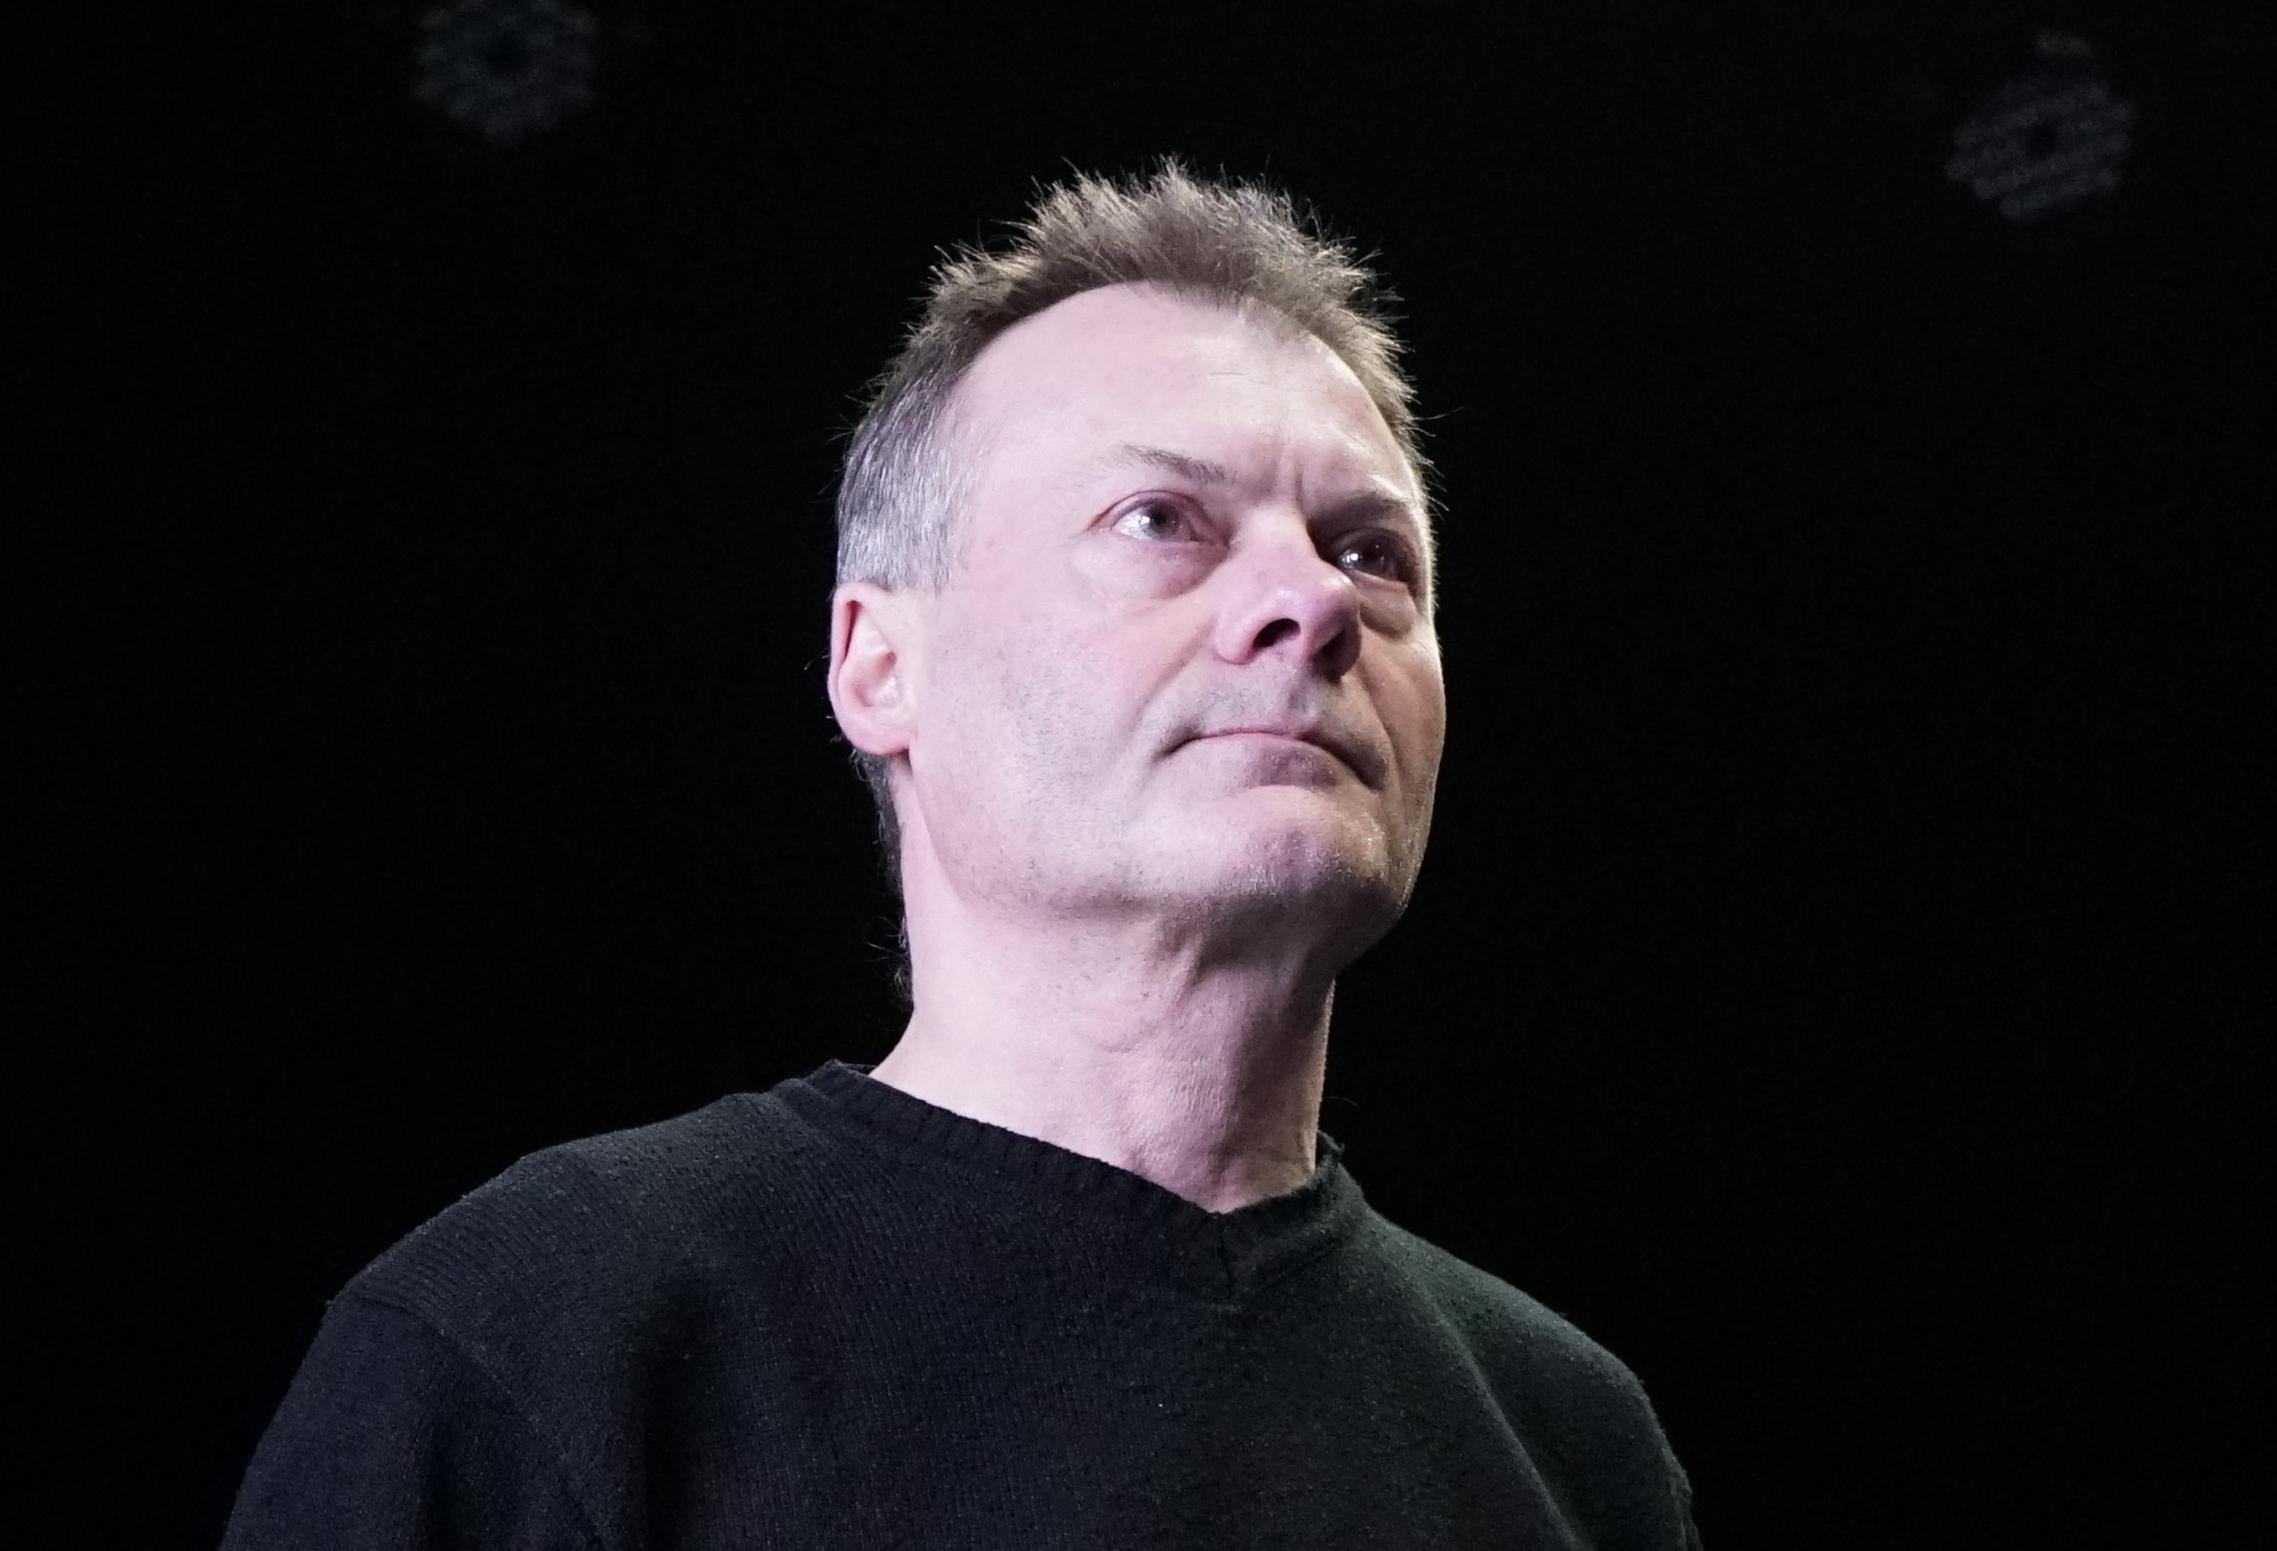 Thierry maricourt